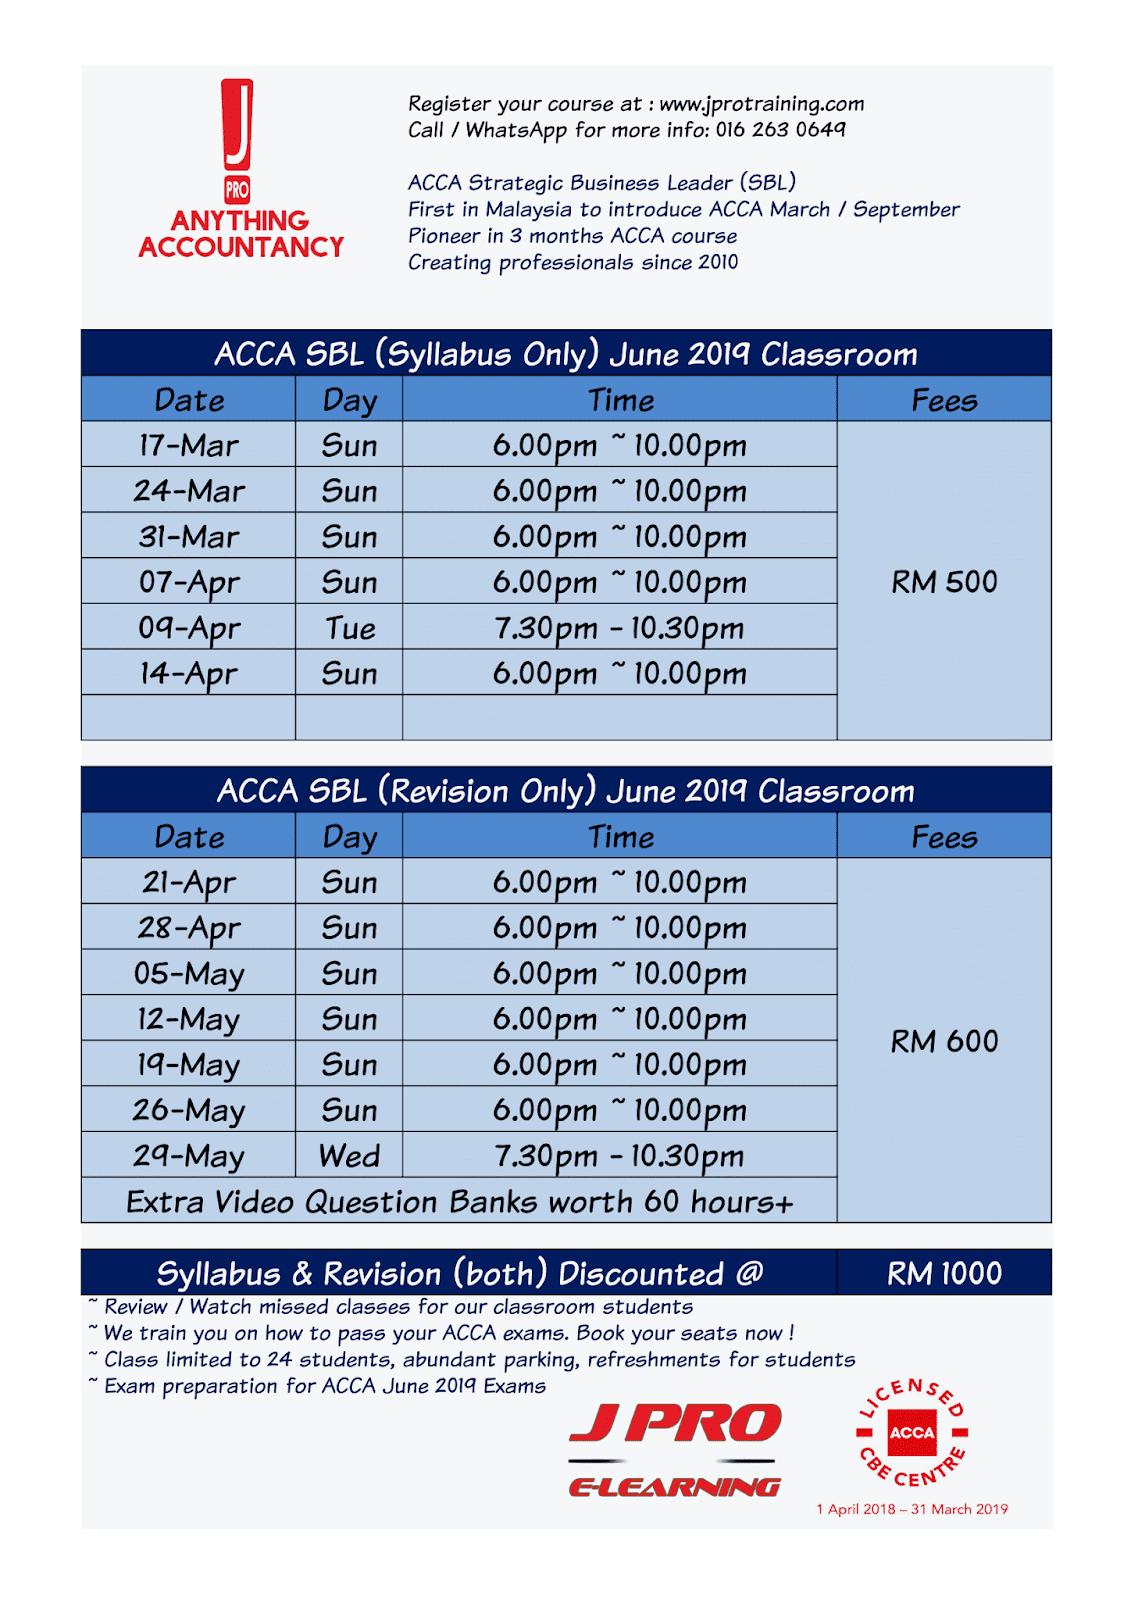 J Pro Business Training: ACCA JUNE 2019 EXAM PREPARATION TIMETABLE